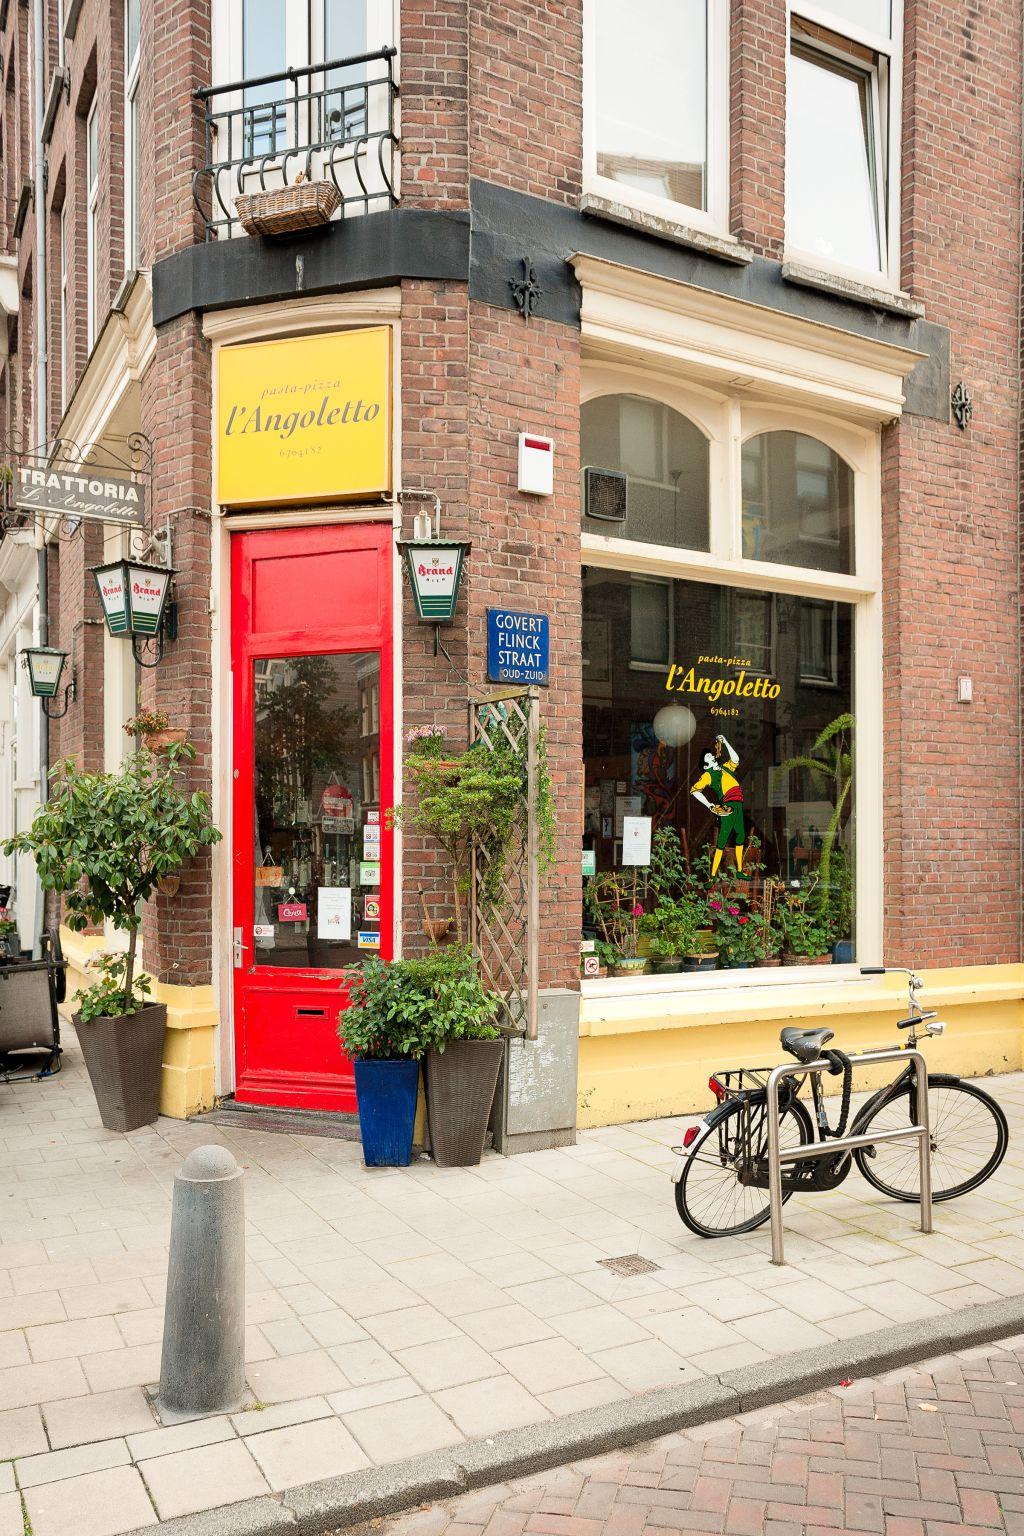 Govert Flinkstraat